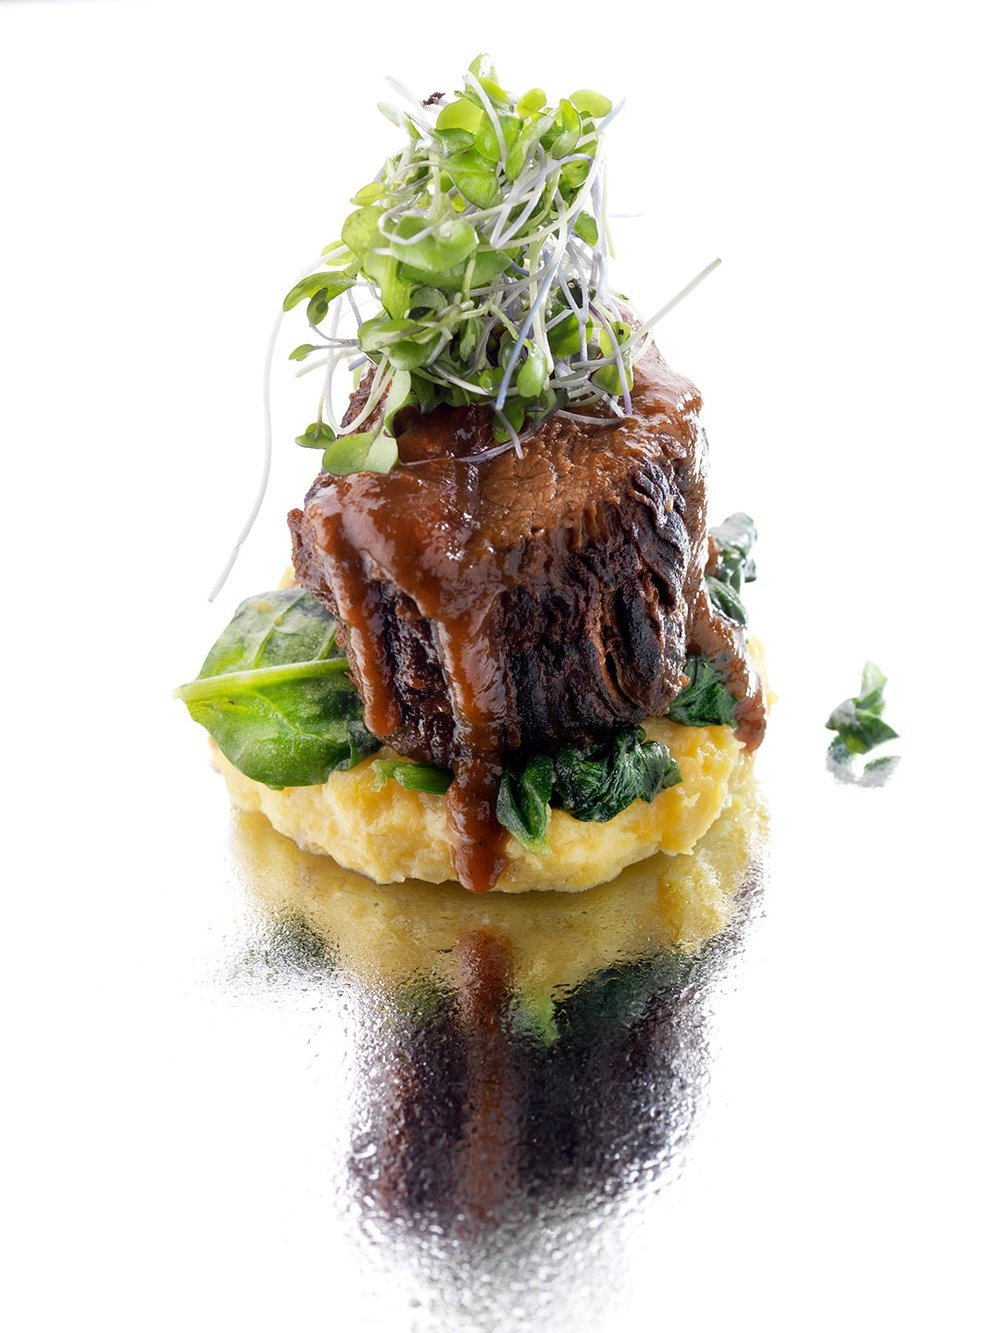 party-food-photography-miami-marcel-boldu.jpg